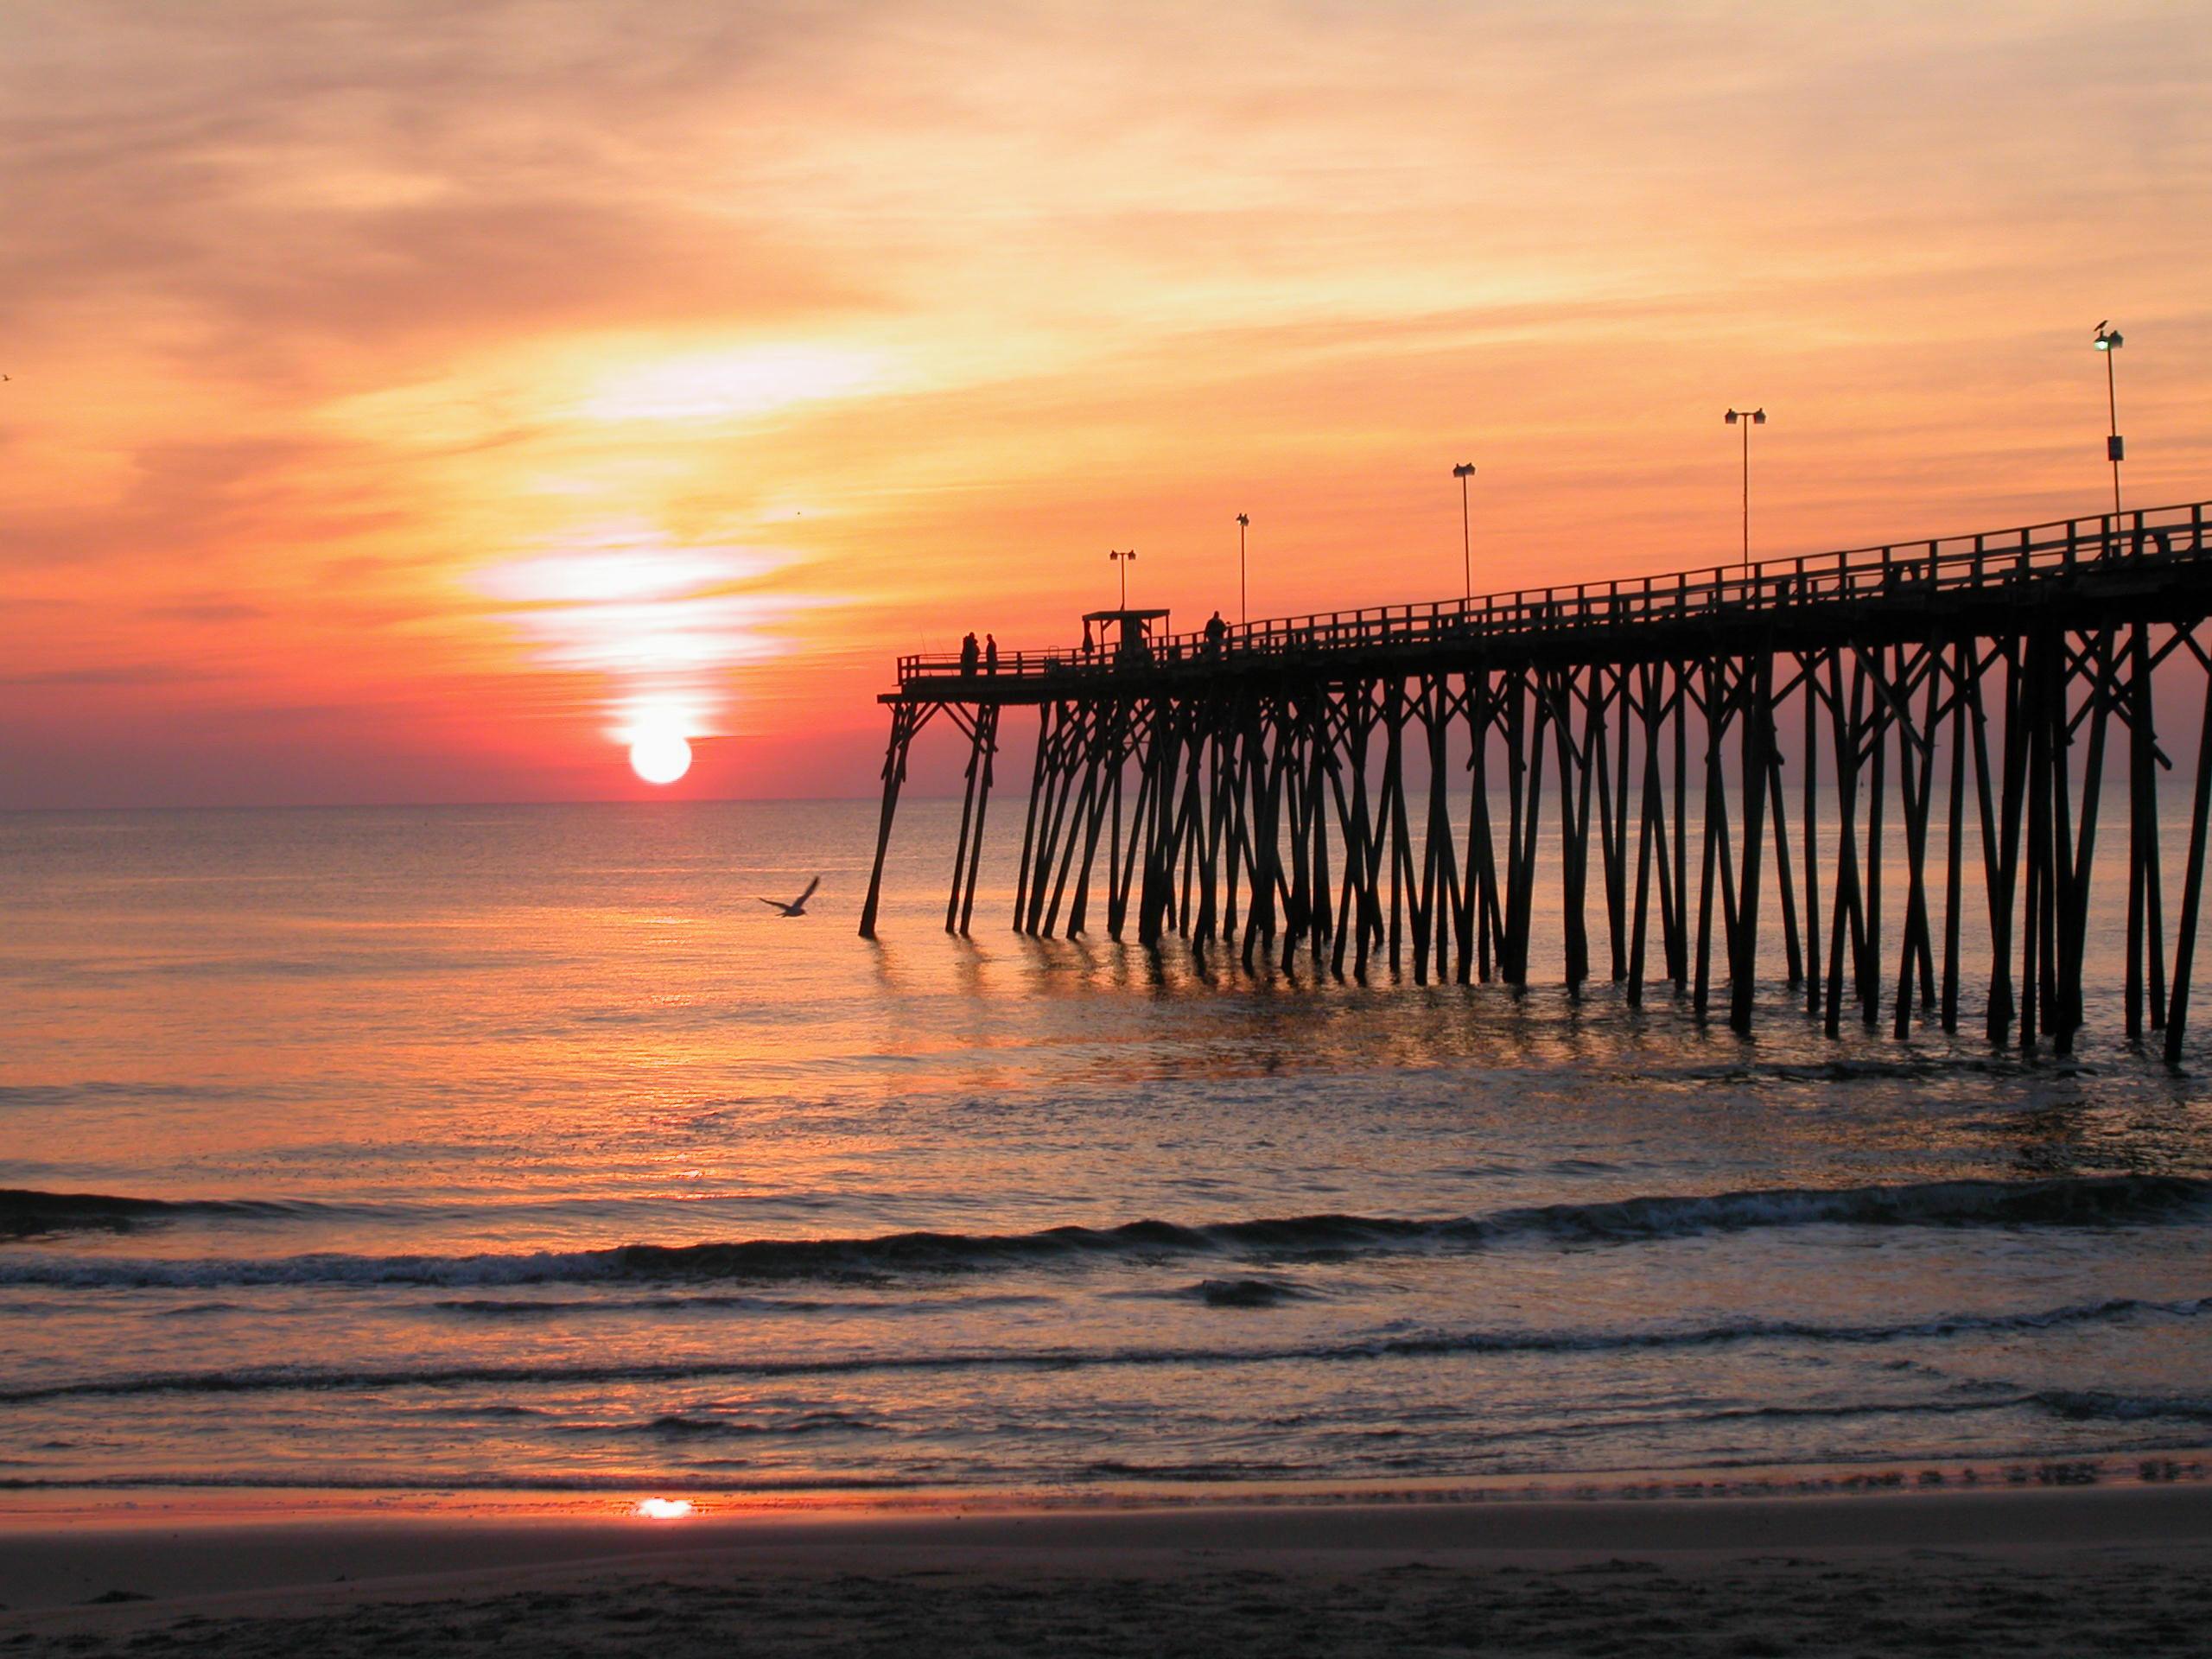 ���� ��� ������ ���� ����  ��������:Kure-Beach-Fishing-Pier-at-Sunrise-Wilmington-NC_mr.jpg ���������:270 ��������:900.1 �������� �����:28491